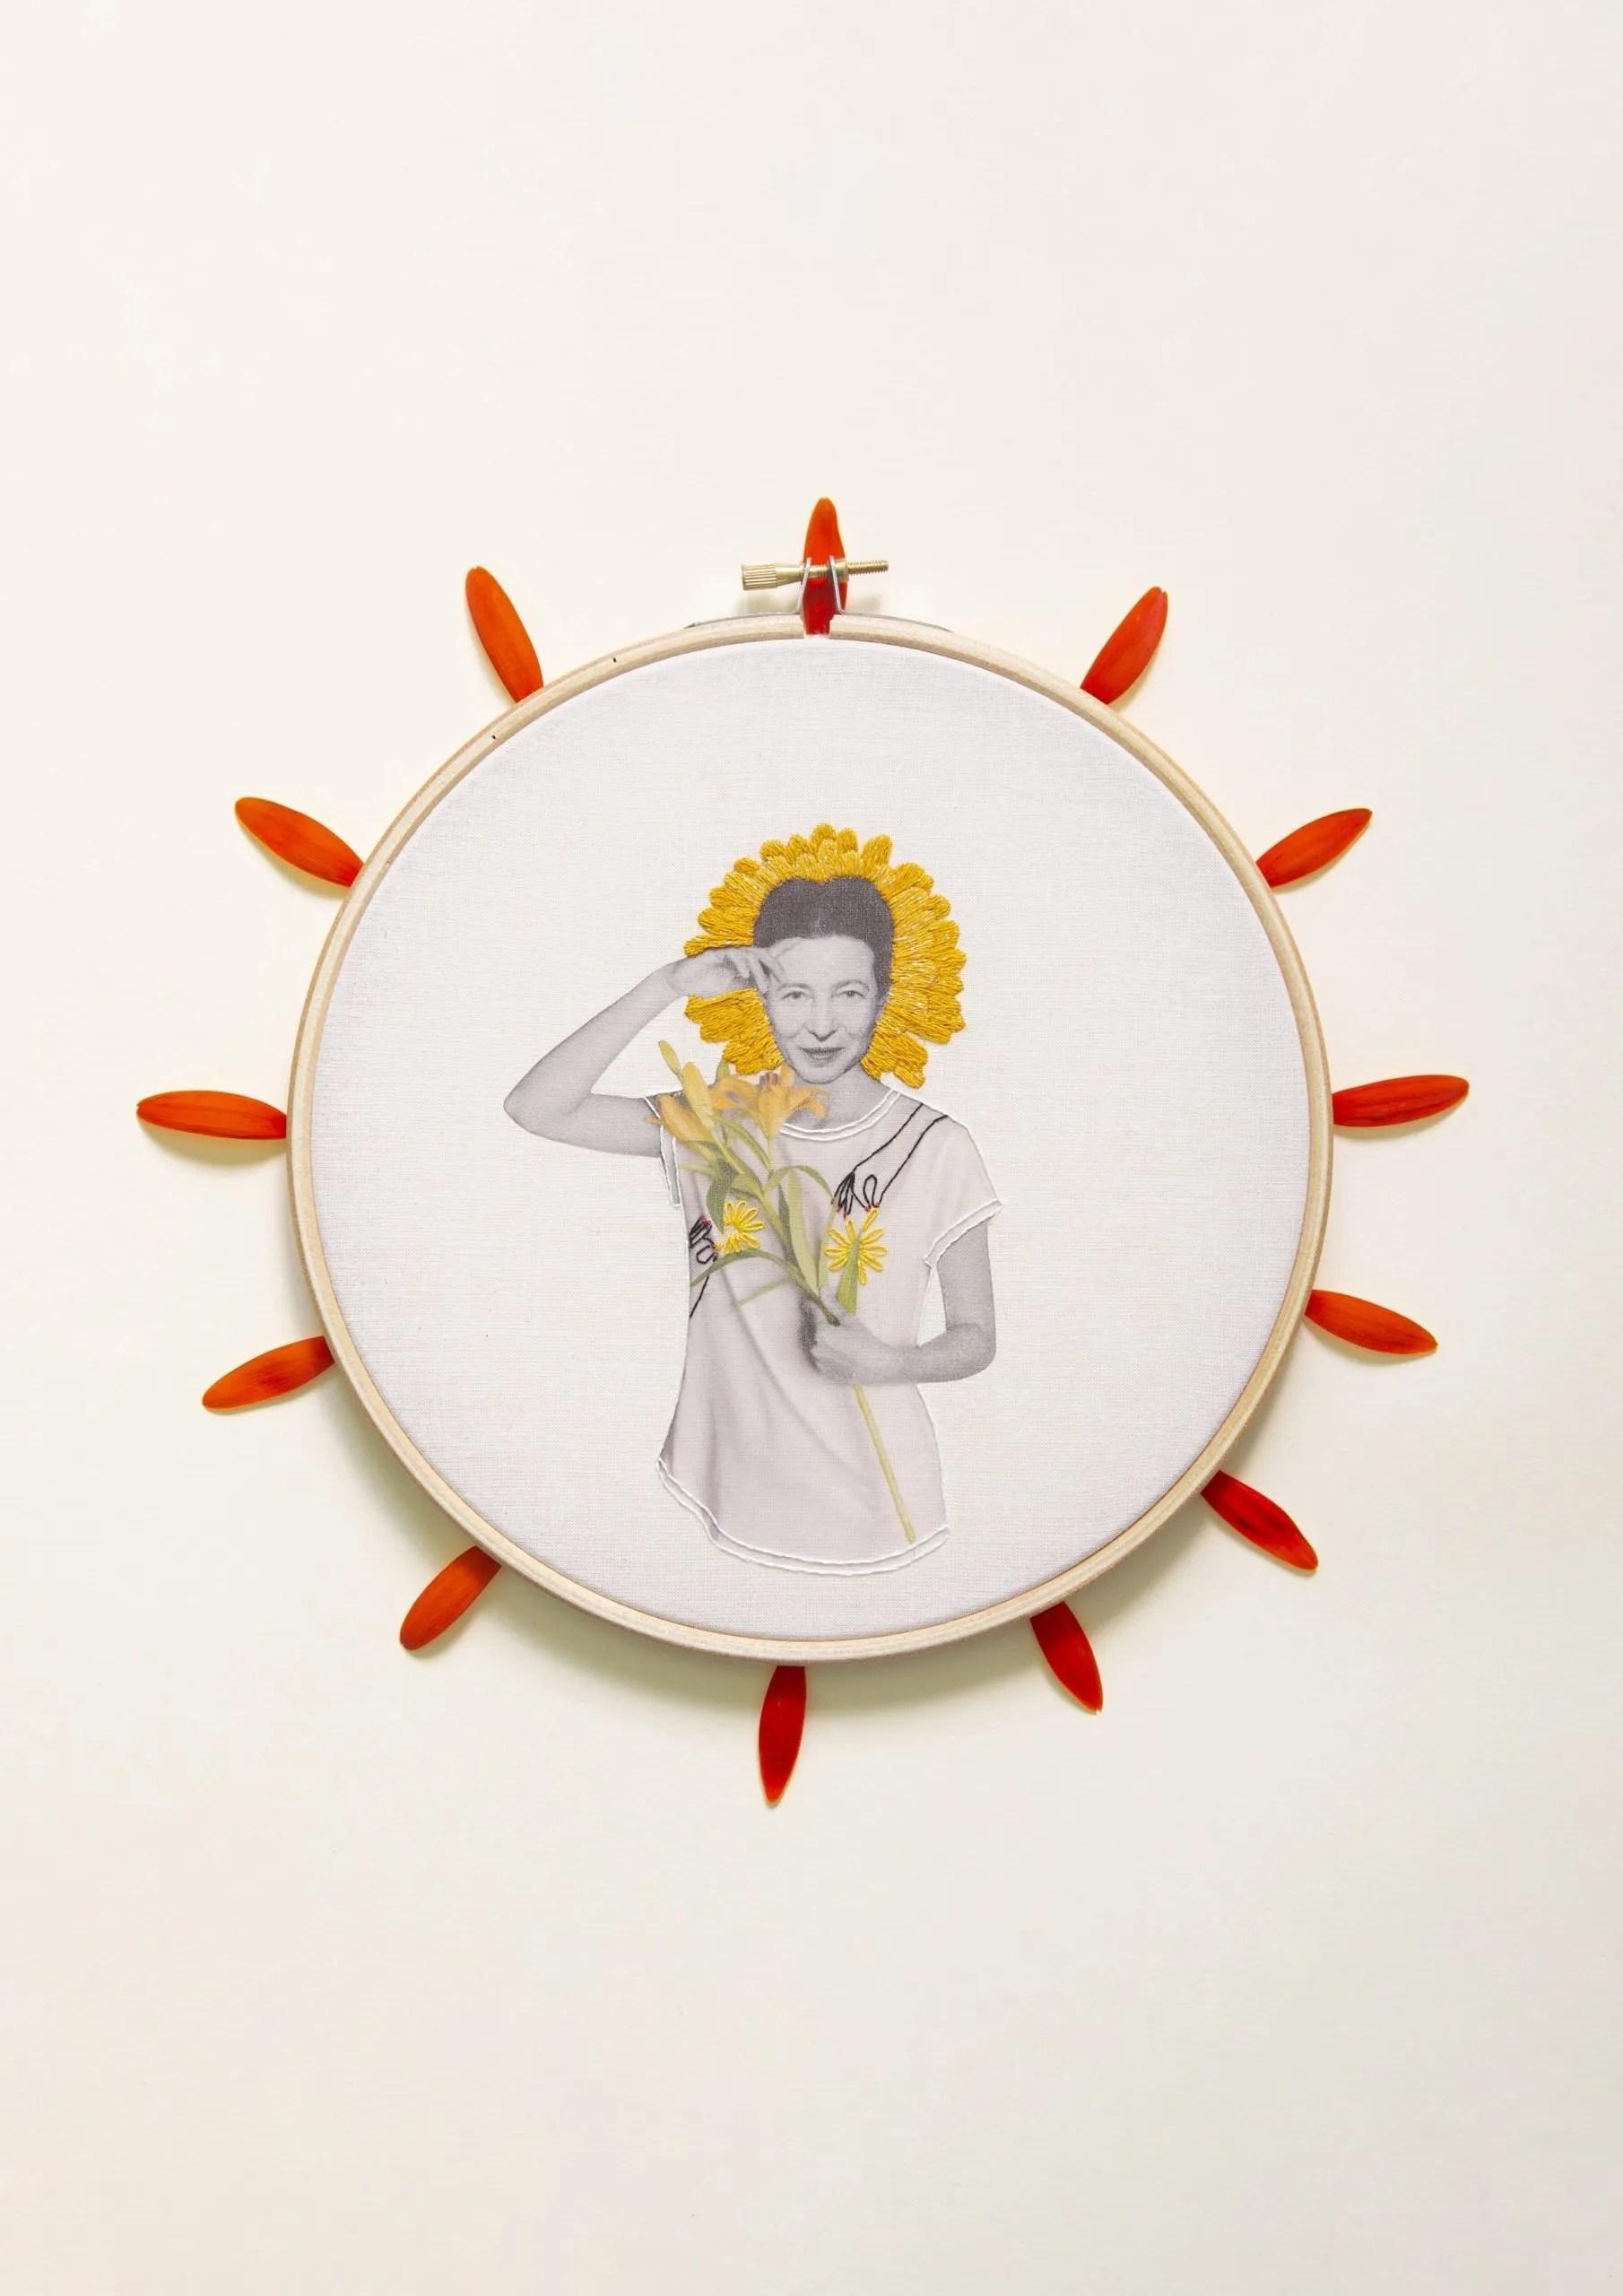 Simone de Beauvoir Collage Studio Variopinto Crisálida